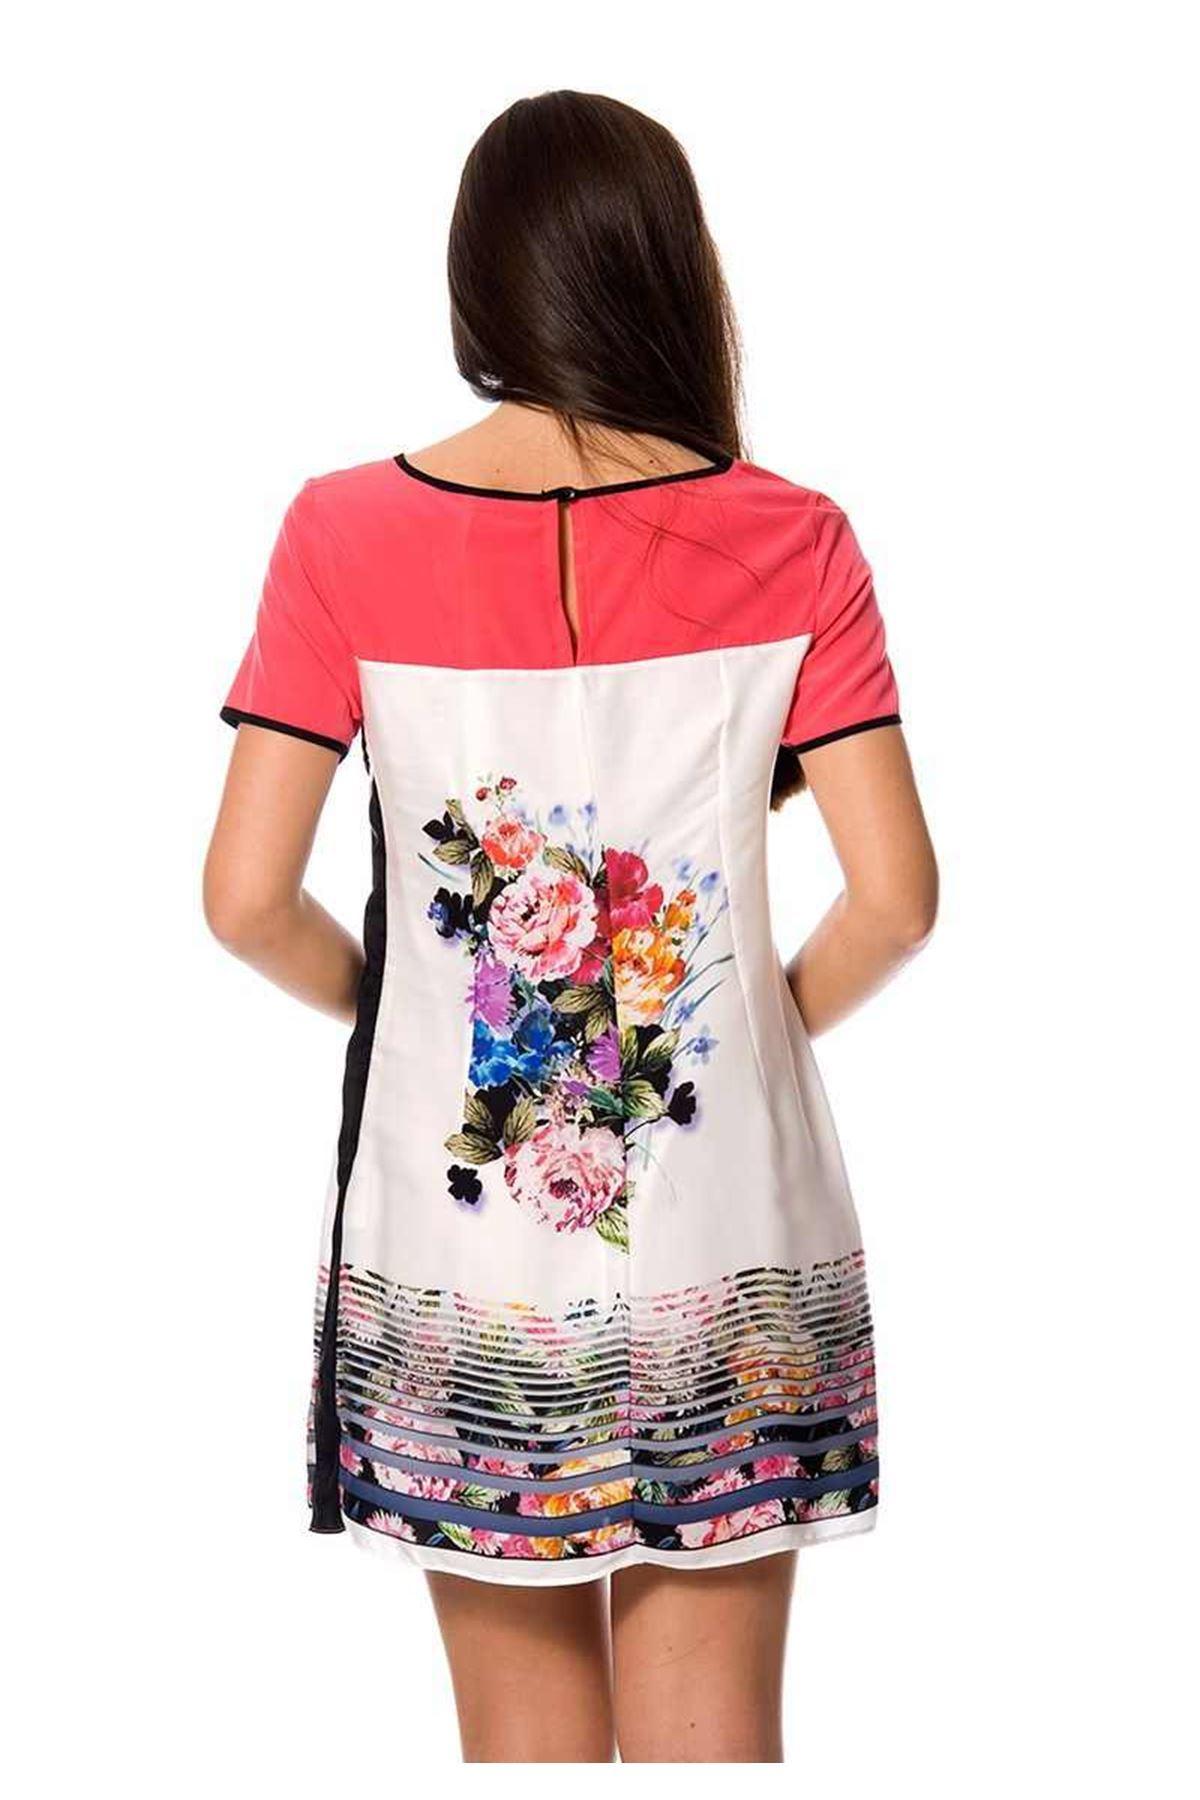 Renkli Çiçek Desenli G5-95333